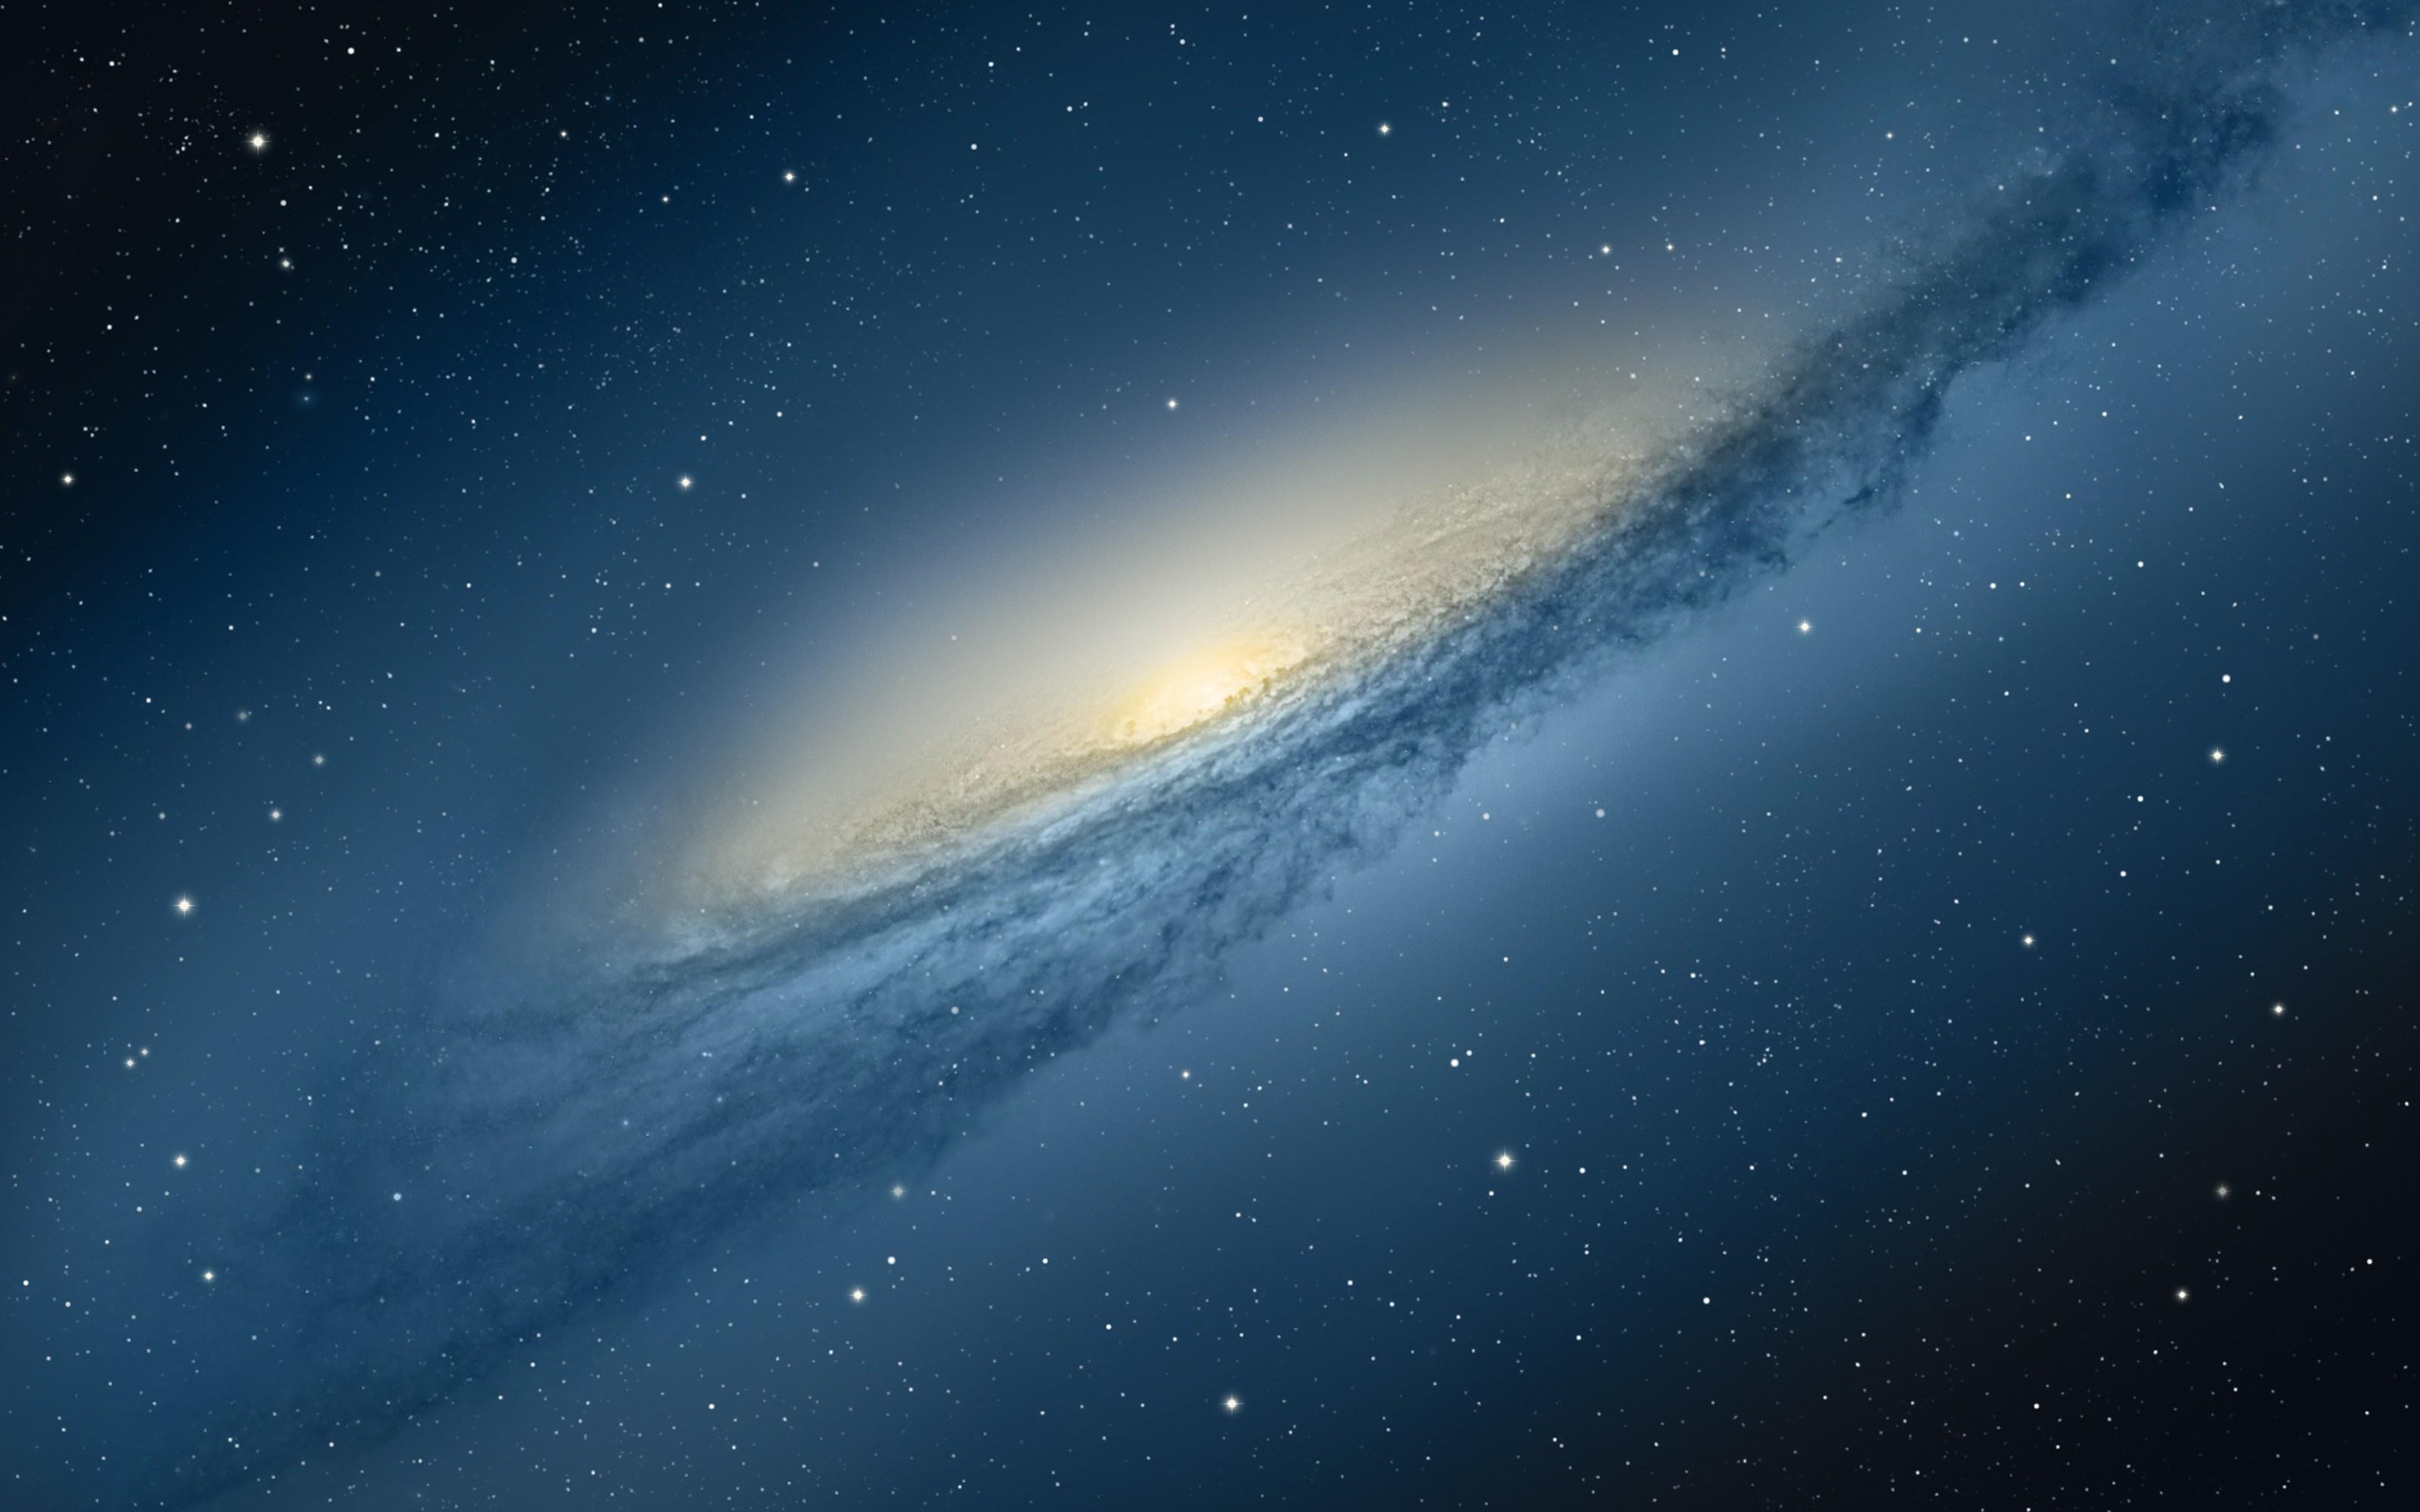 Retina Display Galaxy Wallpaper for Macbook Pro